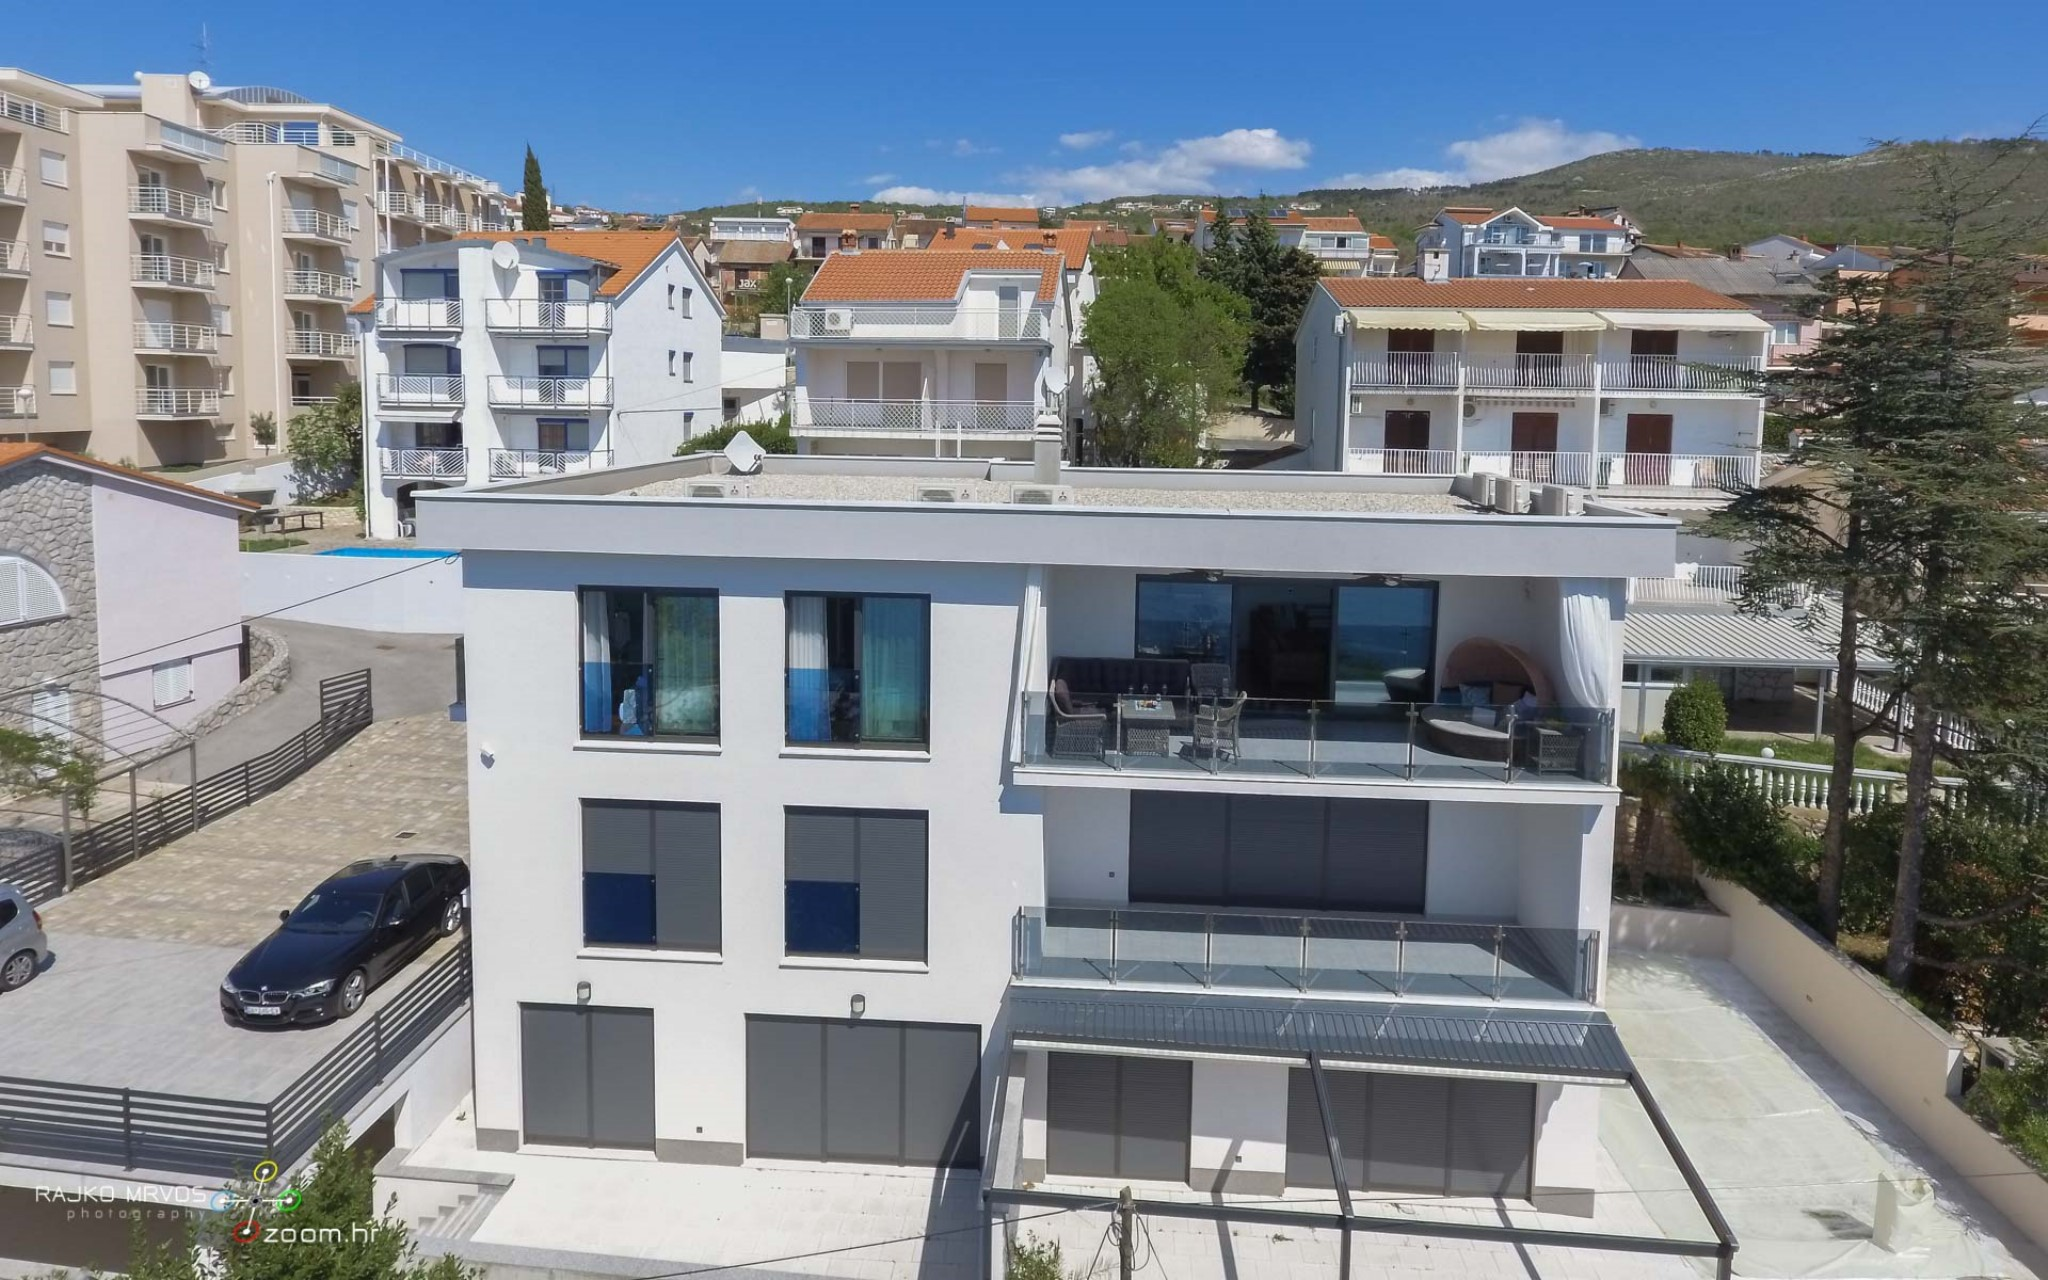 fotografiranje-iz-zraka-eksterijera-dronom-vila-kuca-hotela-apartmana-Larimar-Penthouse-56